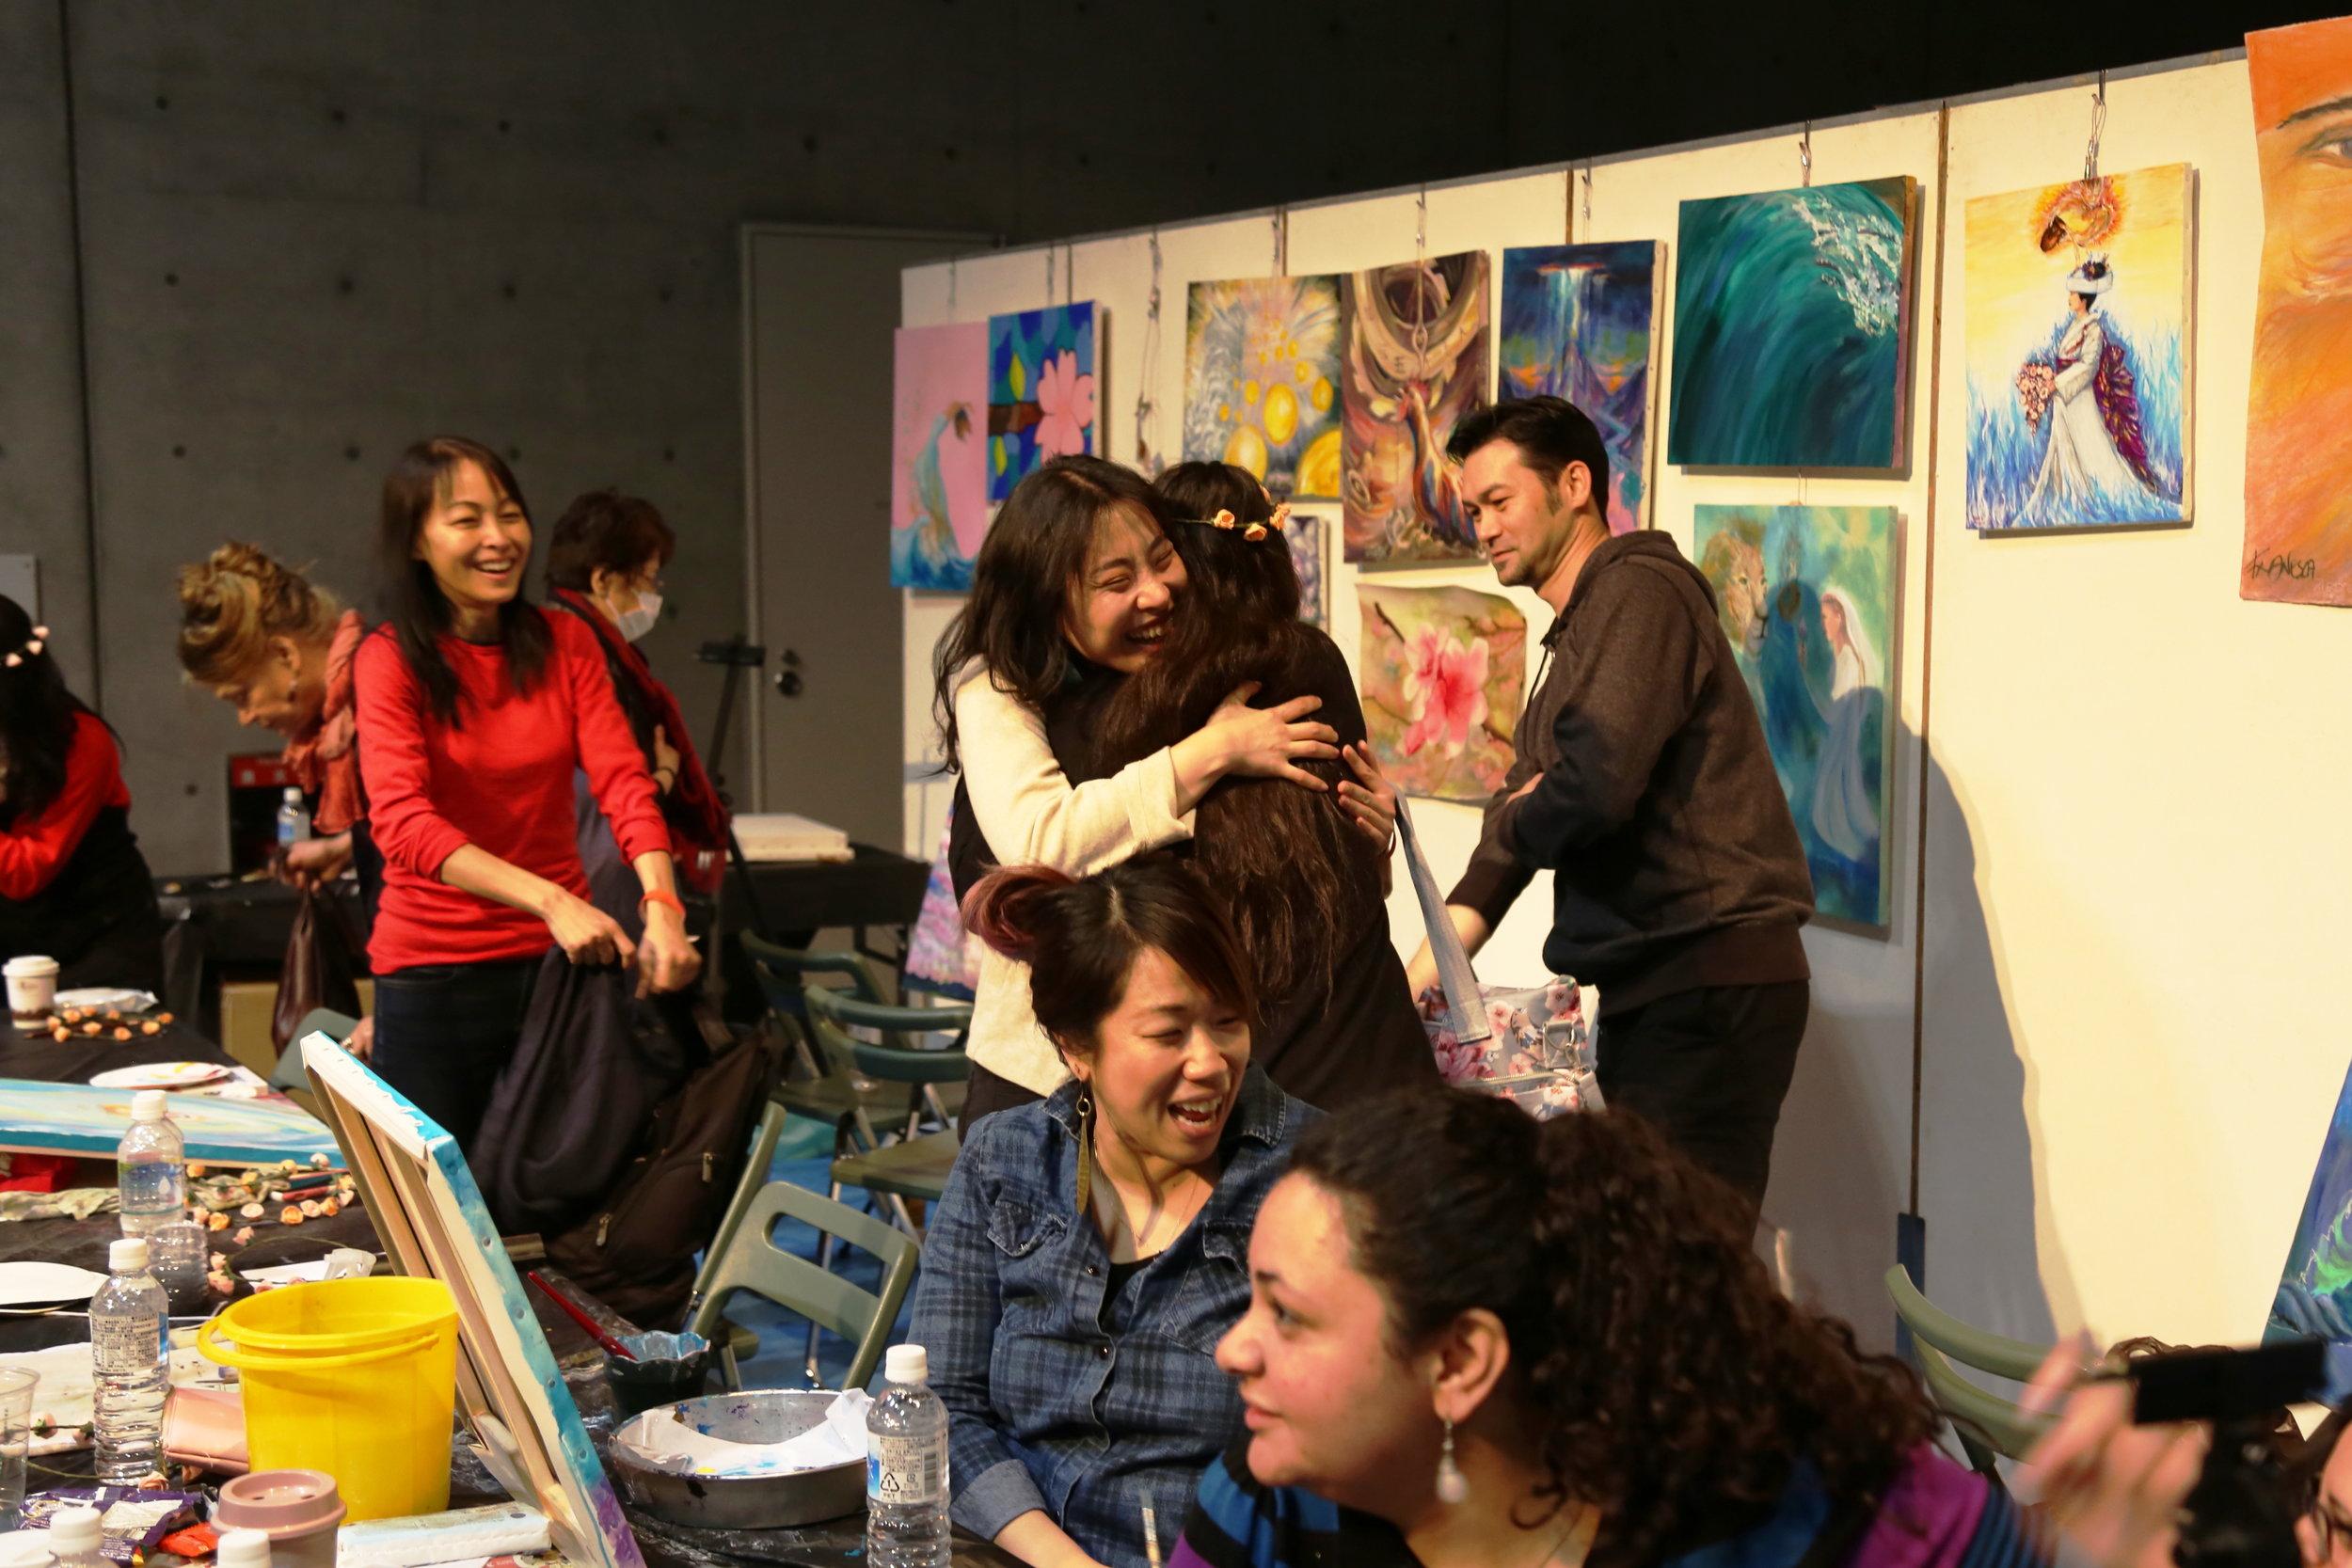 Japan2019-Candids-01.JPG